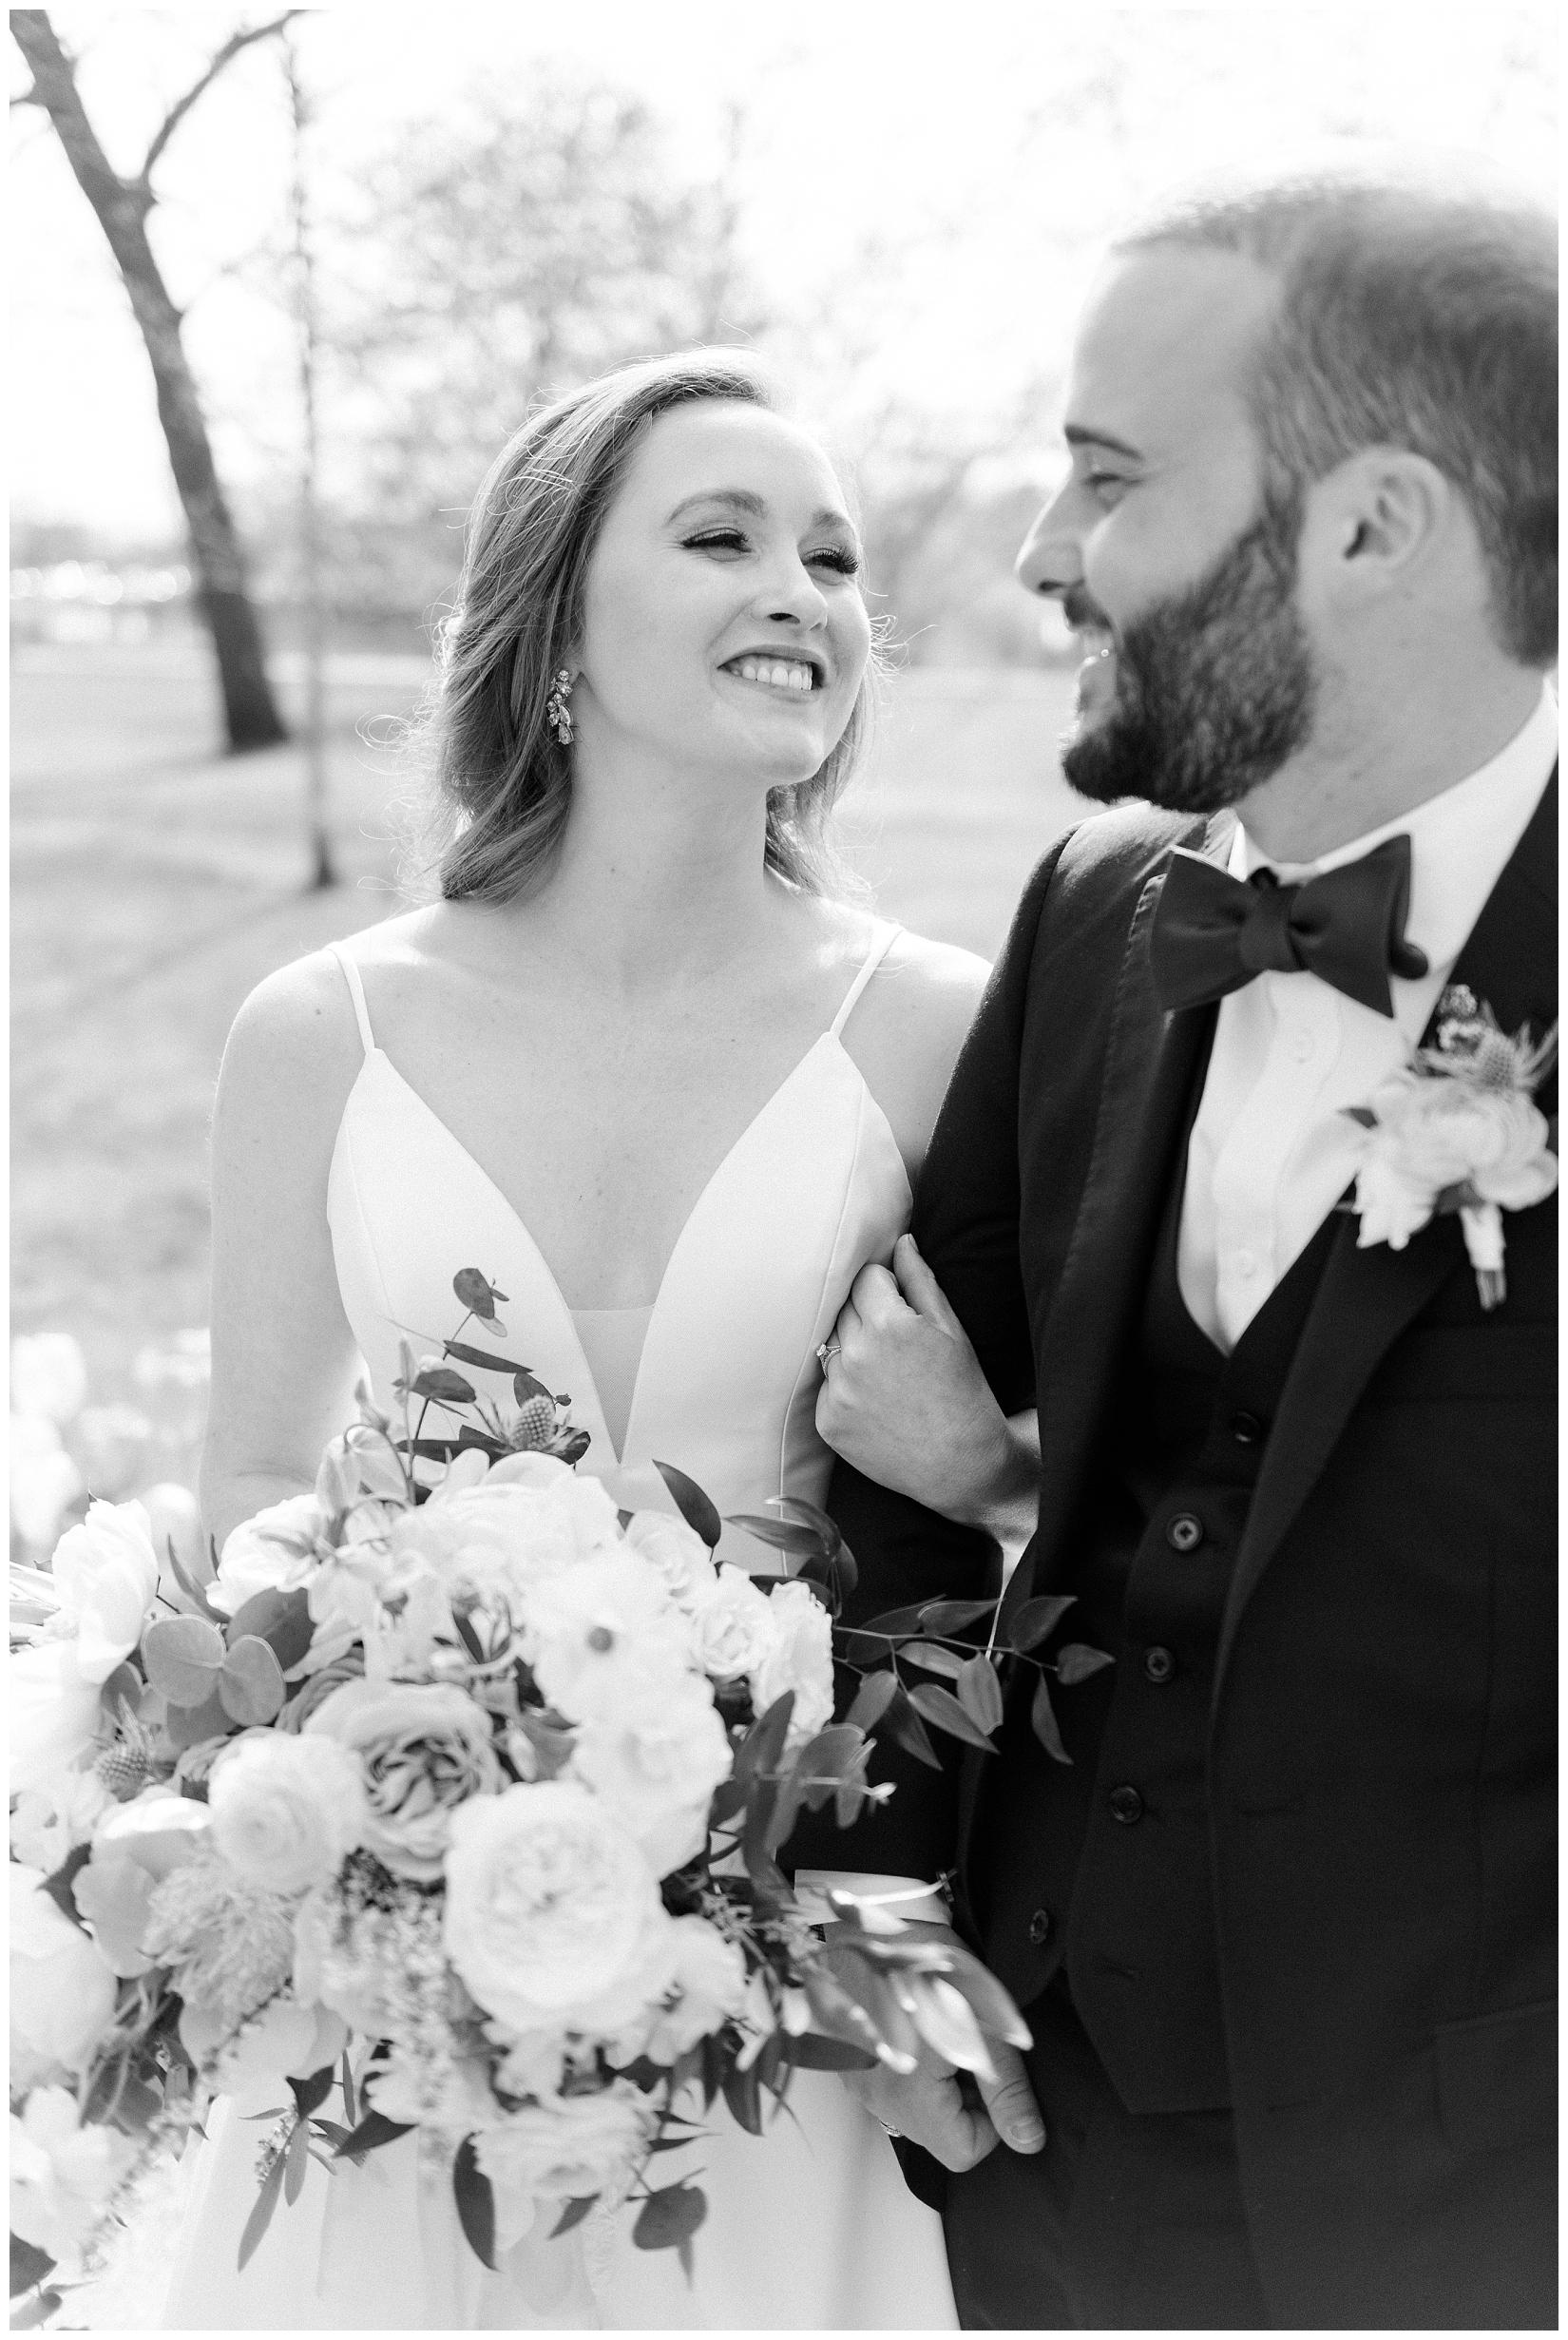 cat-alkire-wedding-photographer-indiana-chicago-indianapolis-fort-wayne_1213.jpg